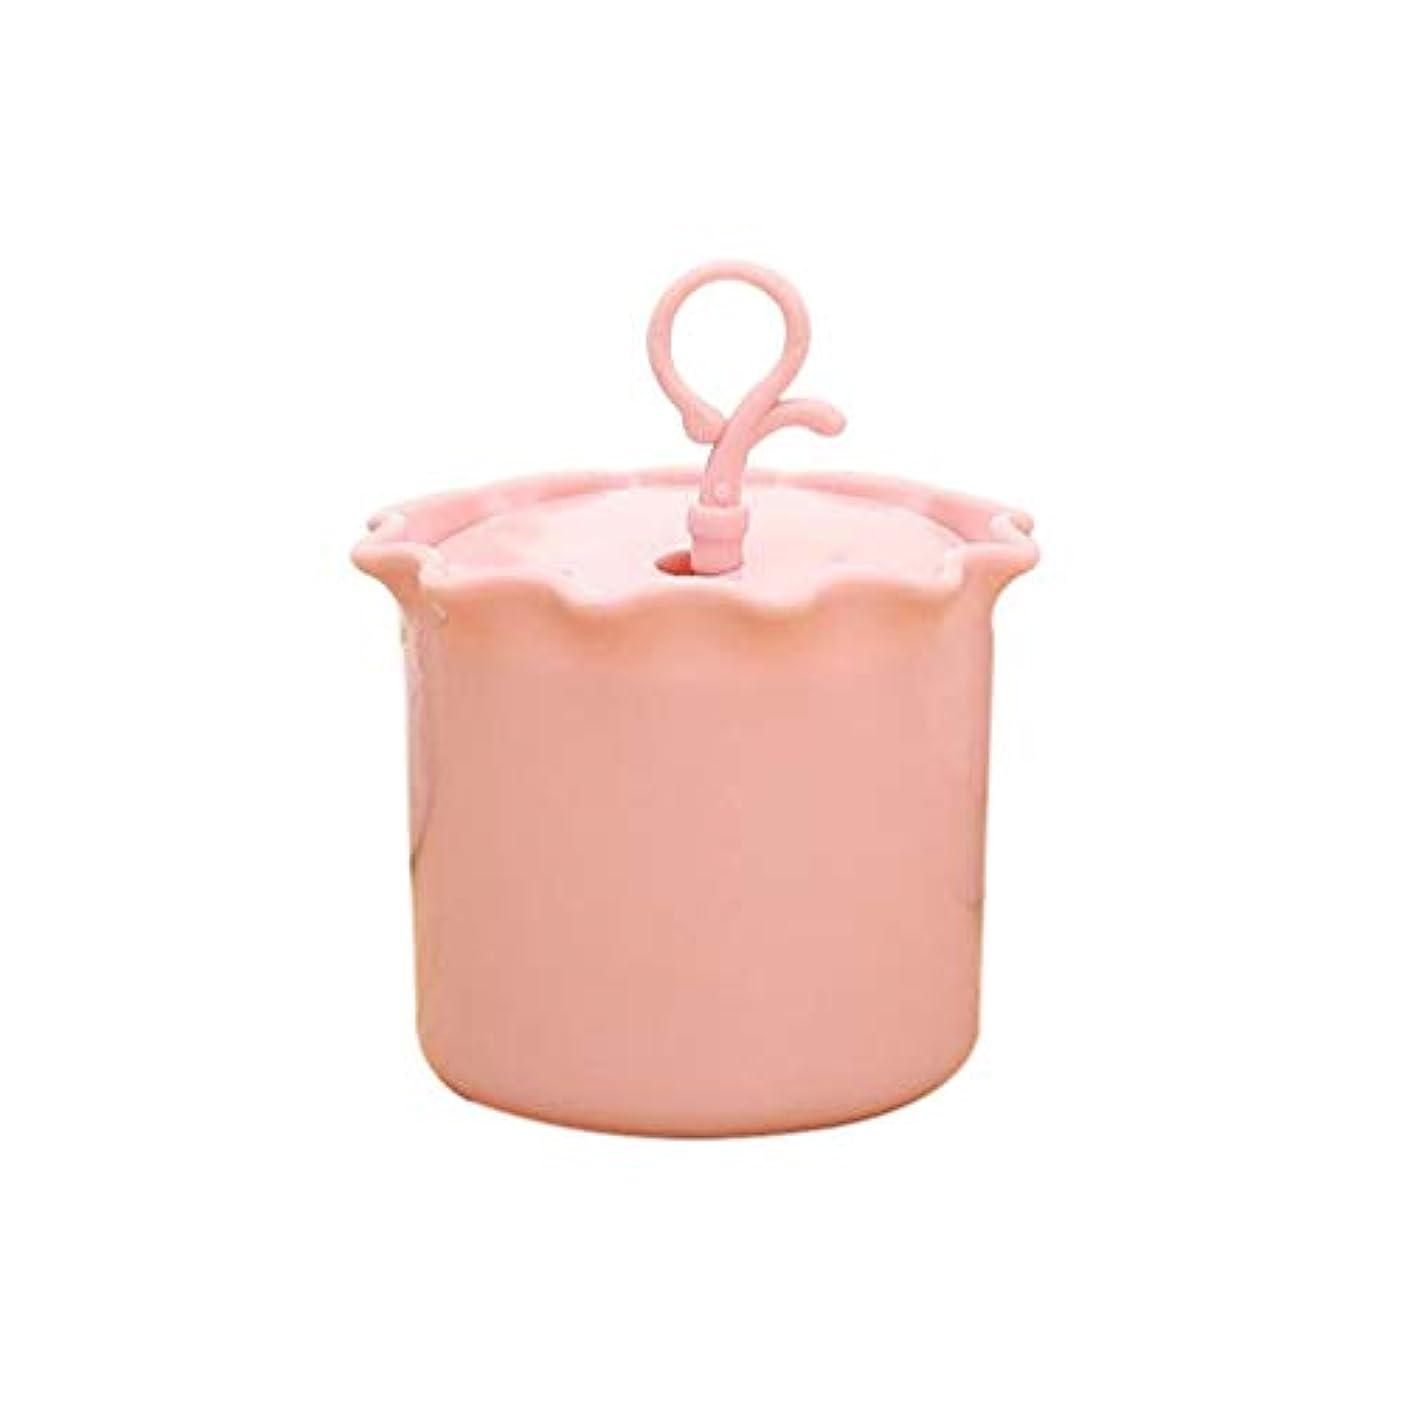 Lurrose ホームホテル旅行1pcのための洗顔の洗剤の泡のコップのための泡メーカー